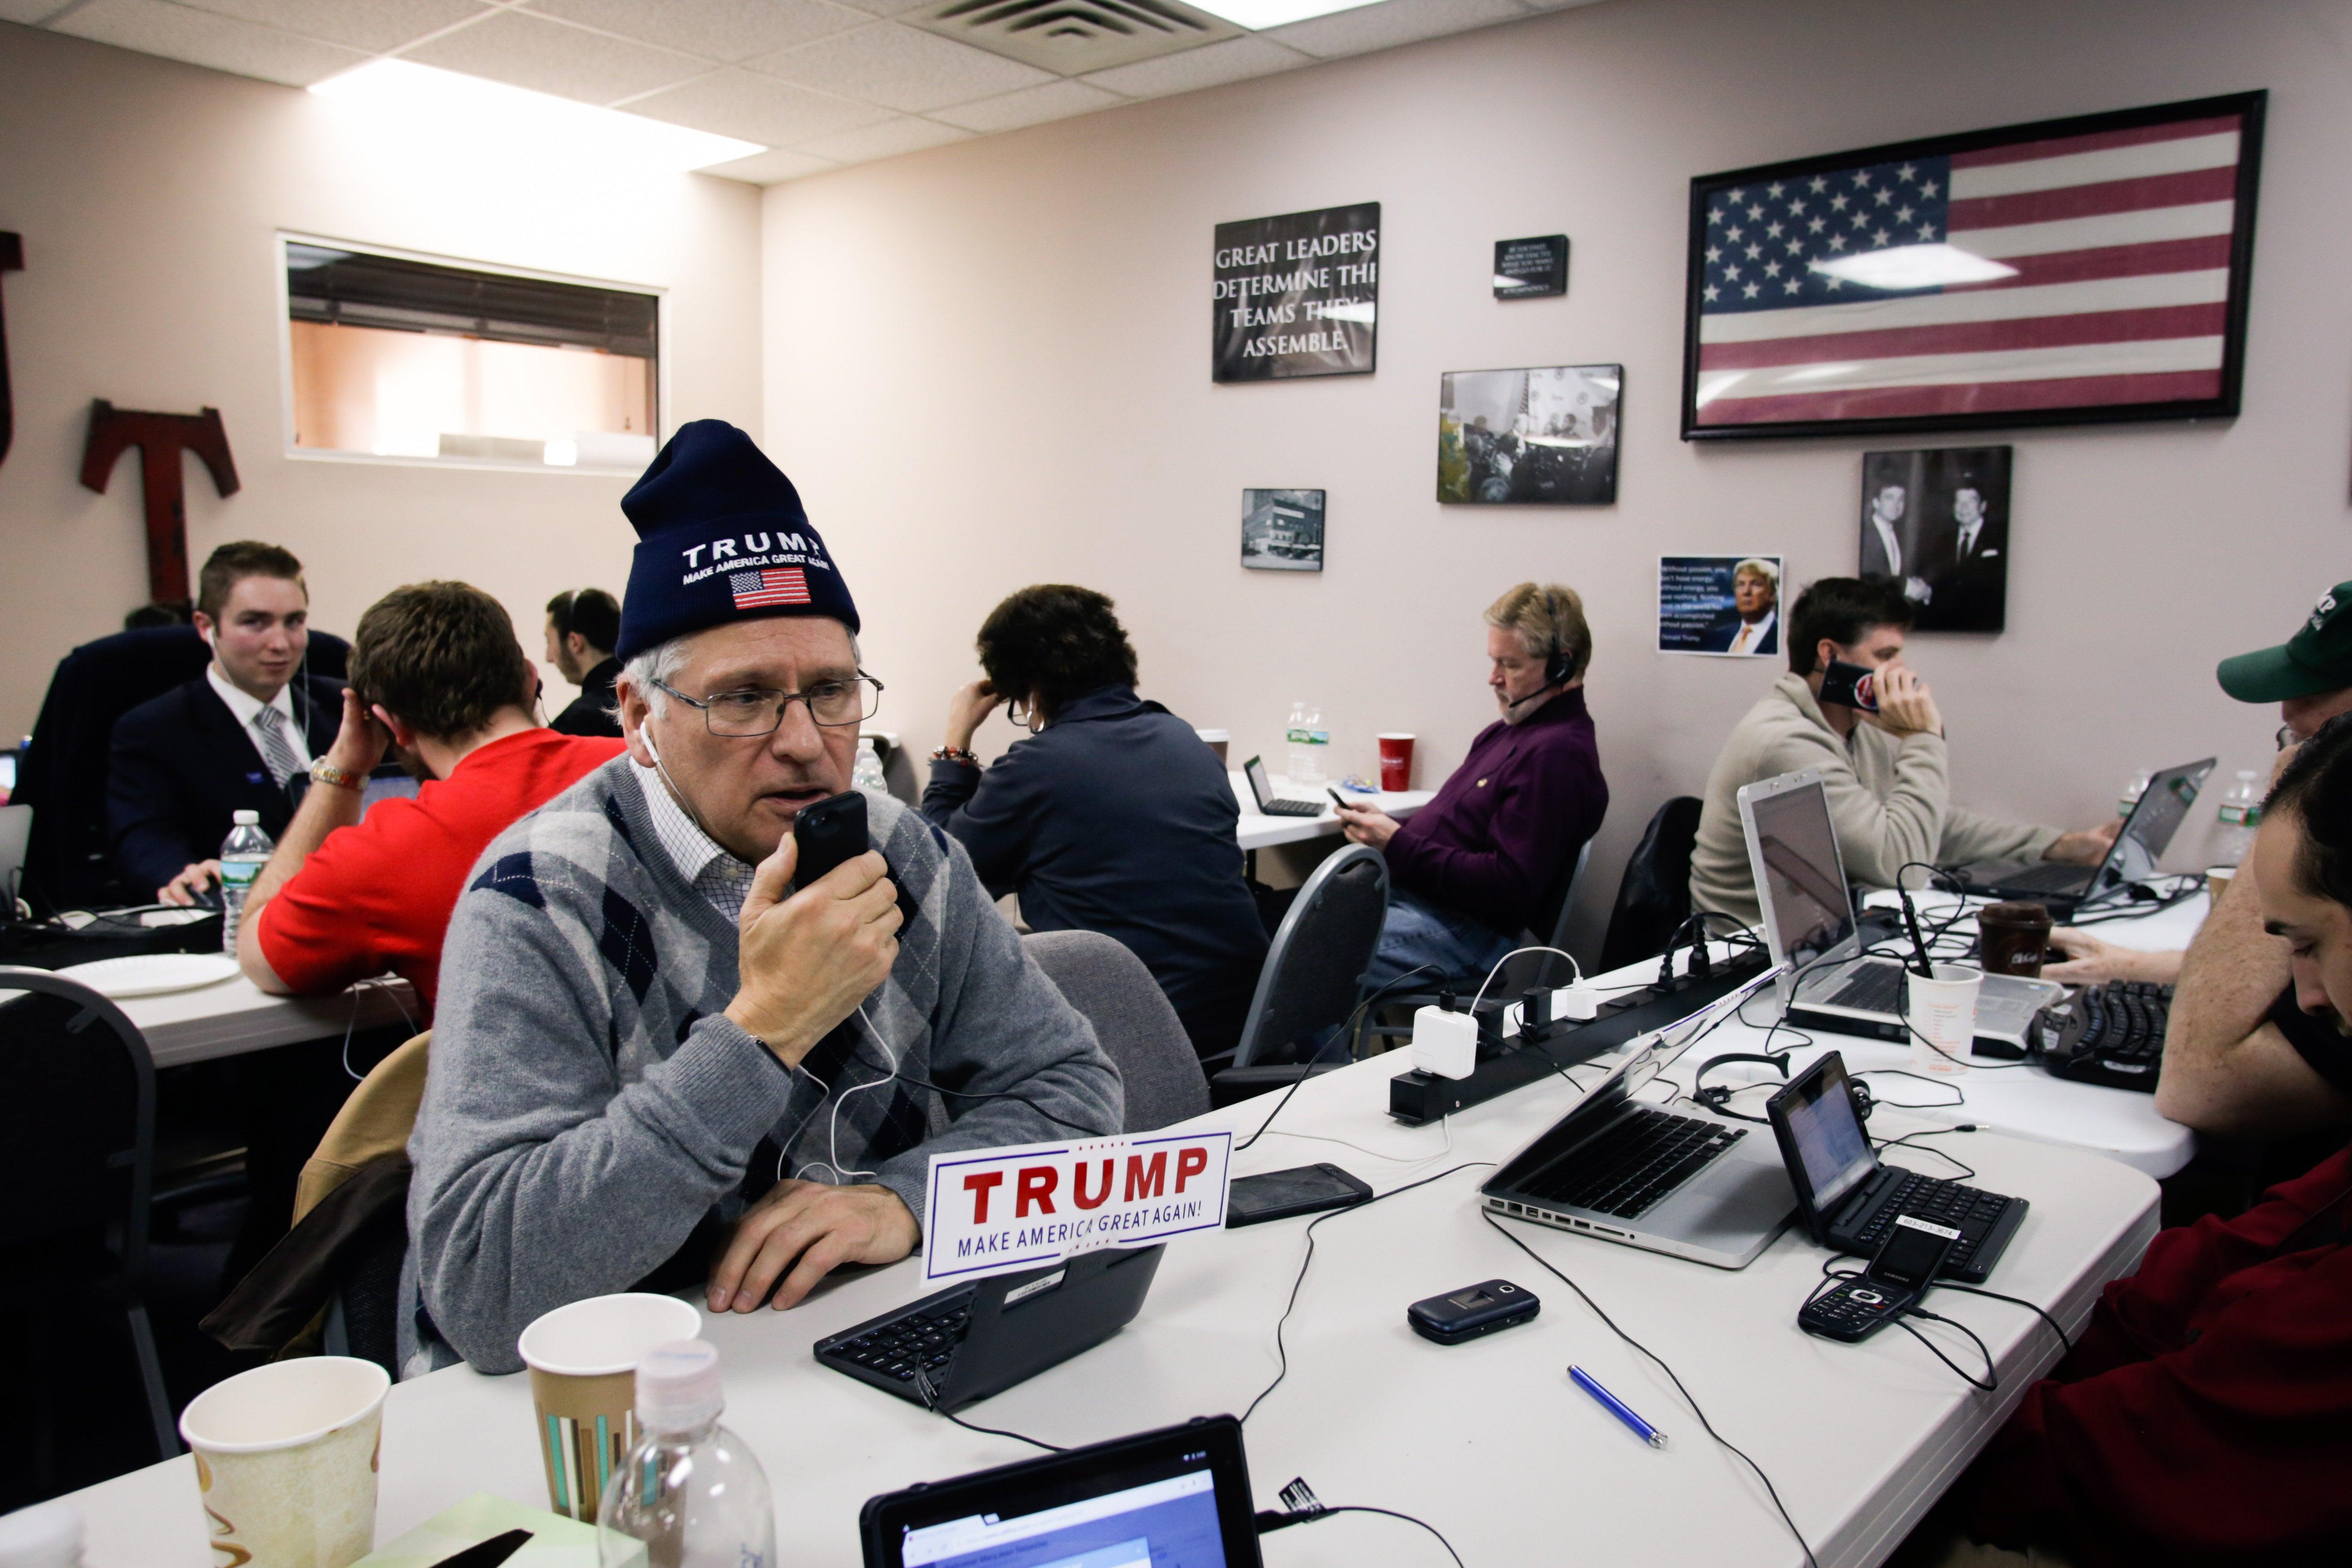 Cesare Del Vaglio, a campaign volunteer for Donald Trump, makes phone calls to New Hampshire voters at Trump's campaign office.